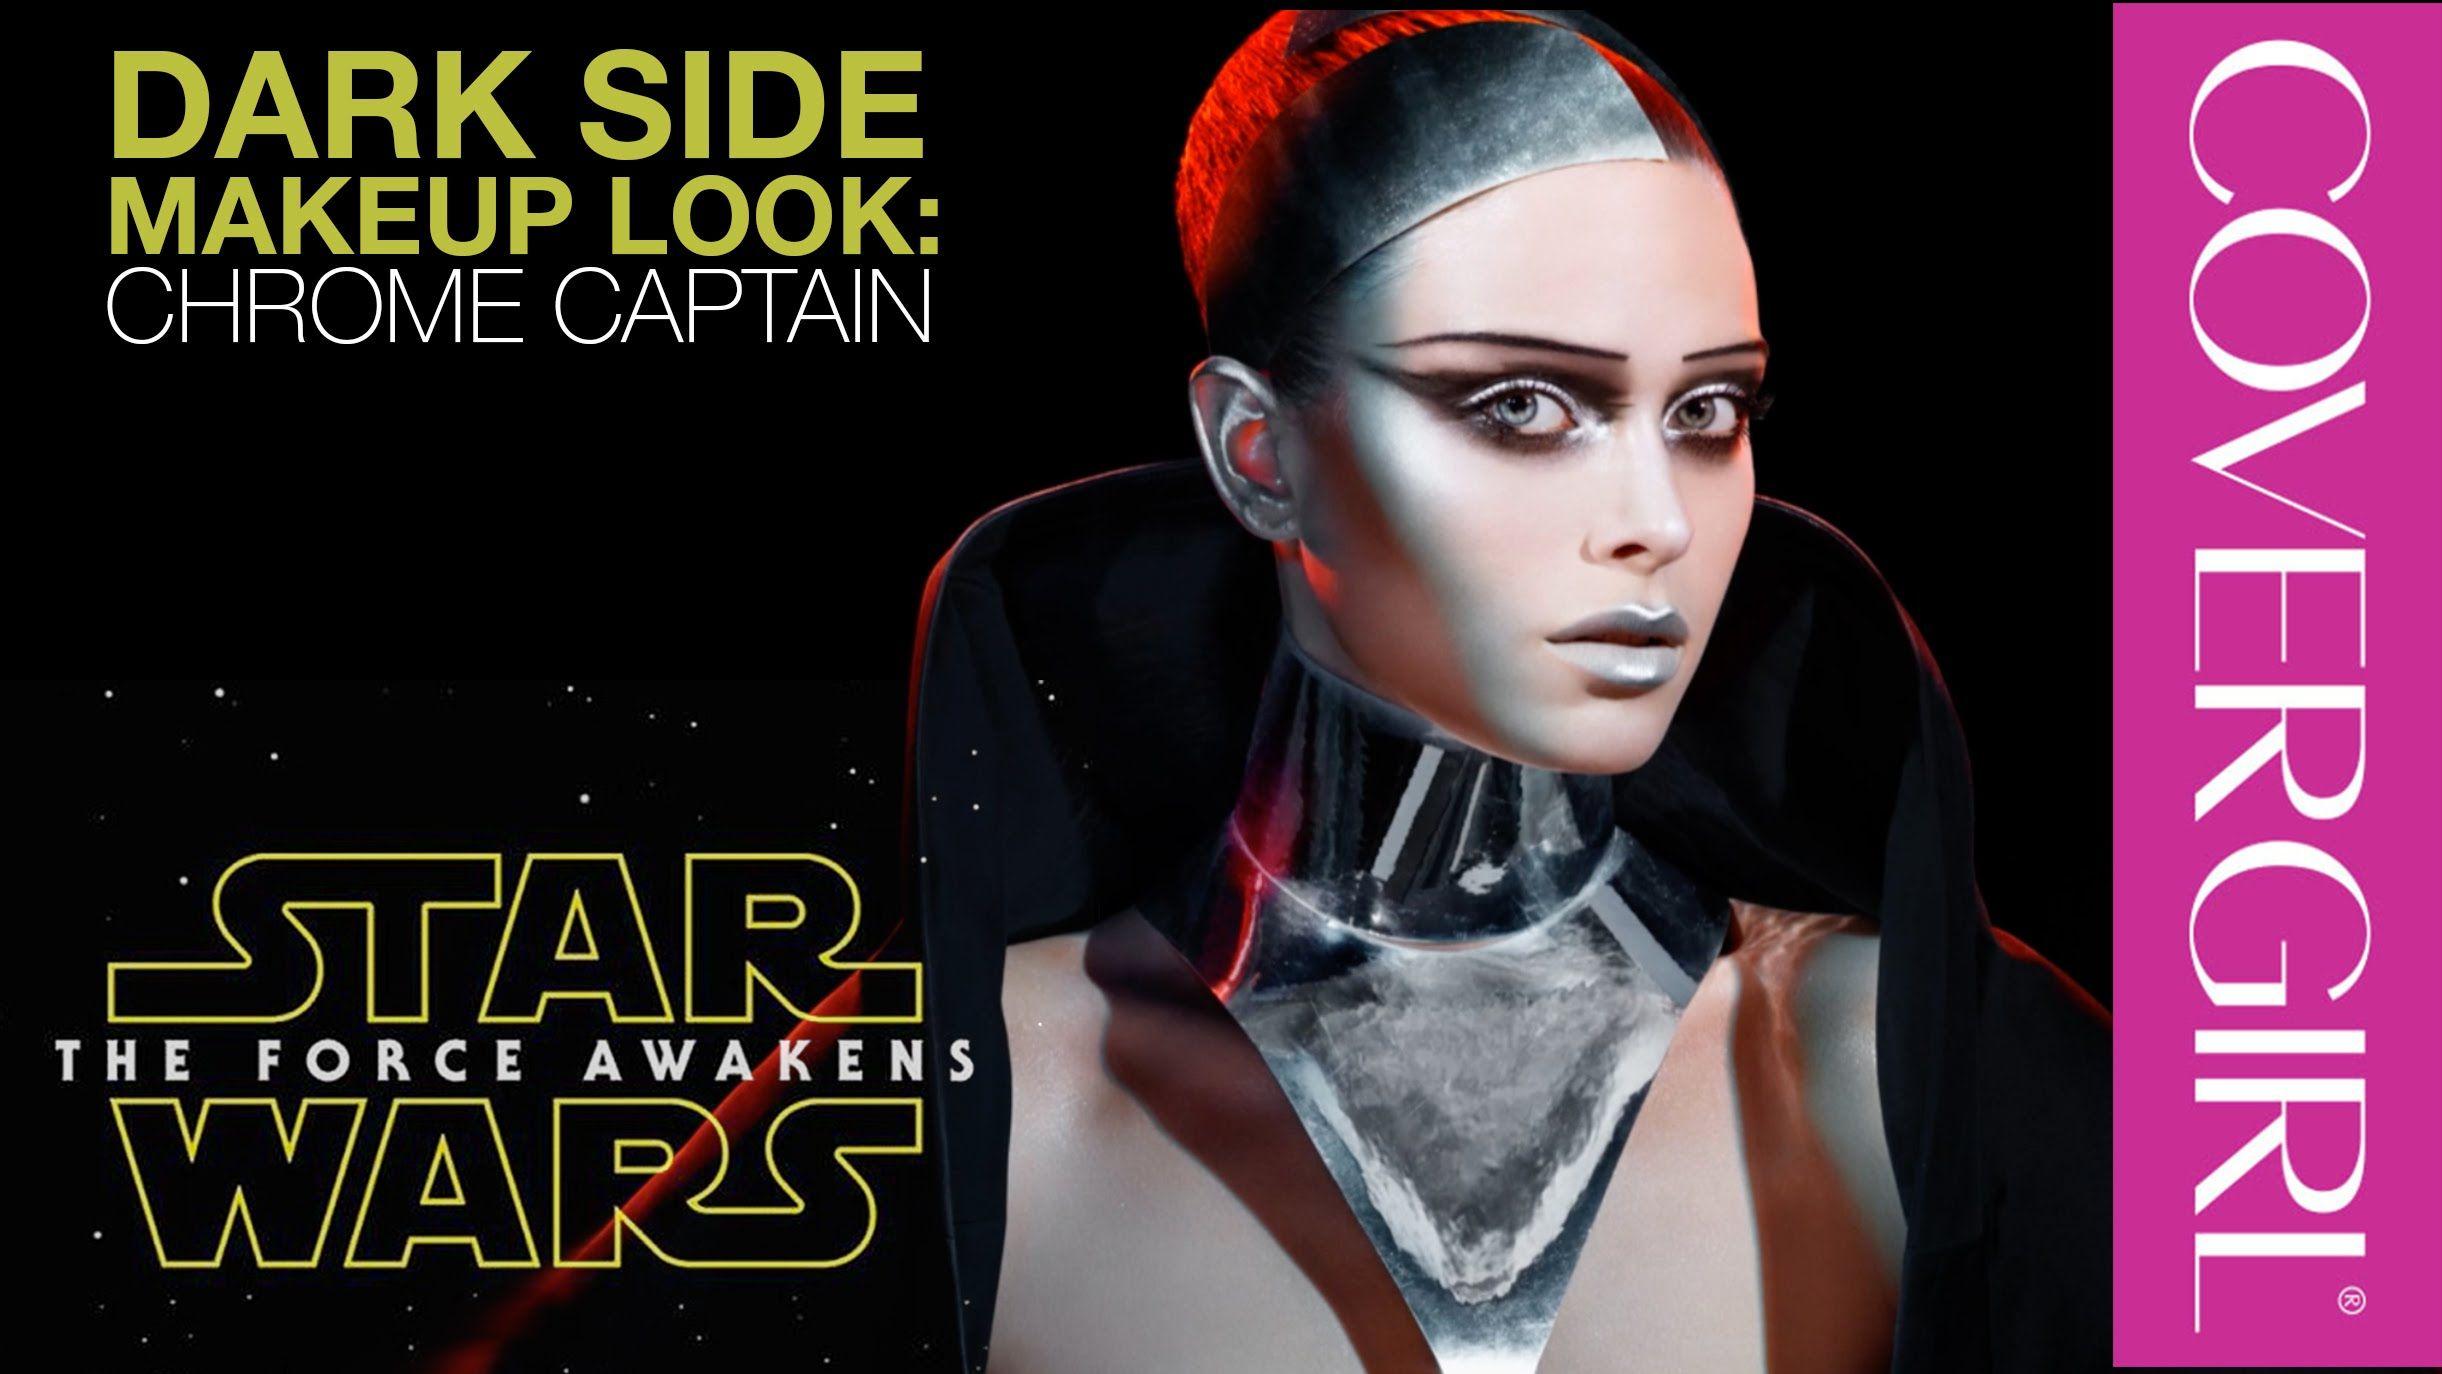 Star Wars Makeup Looks Dark Side s Chrome Captain by Pat McGrath